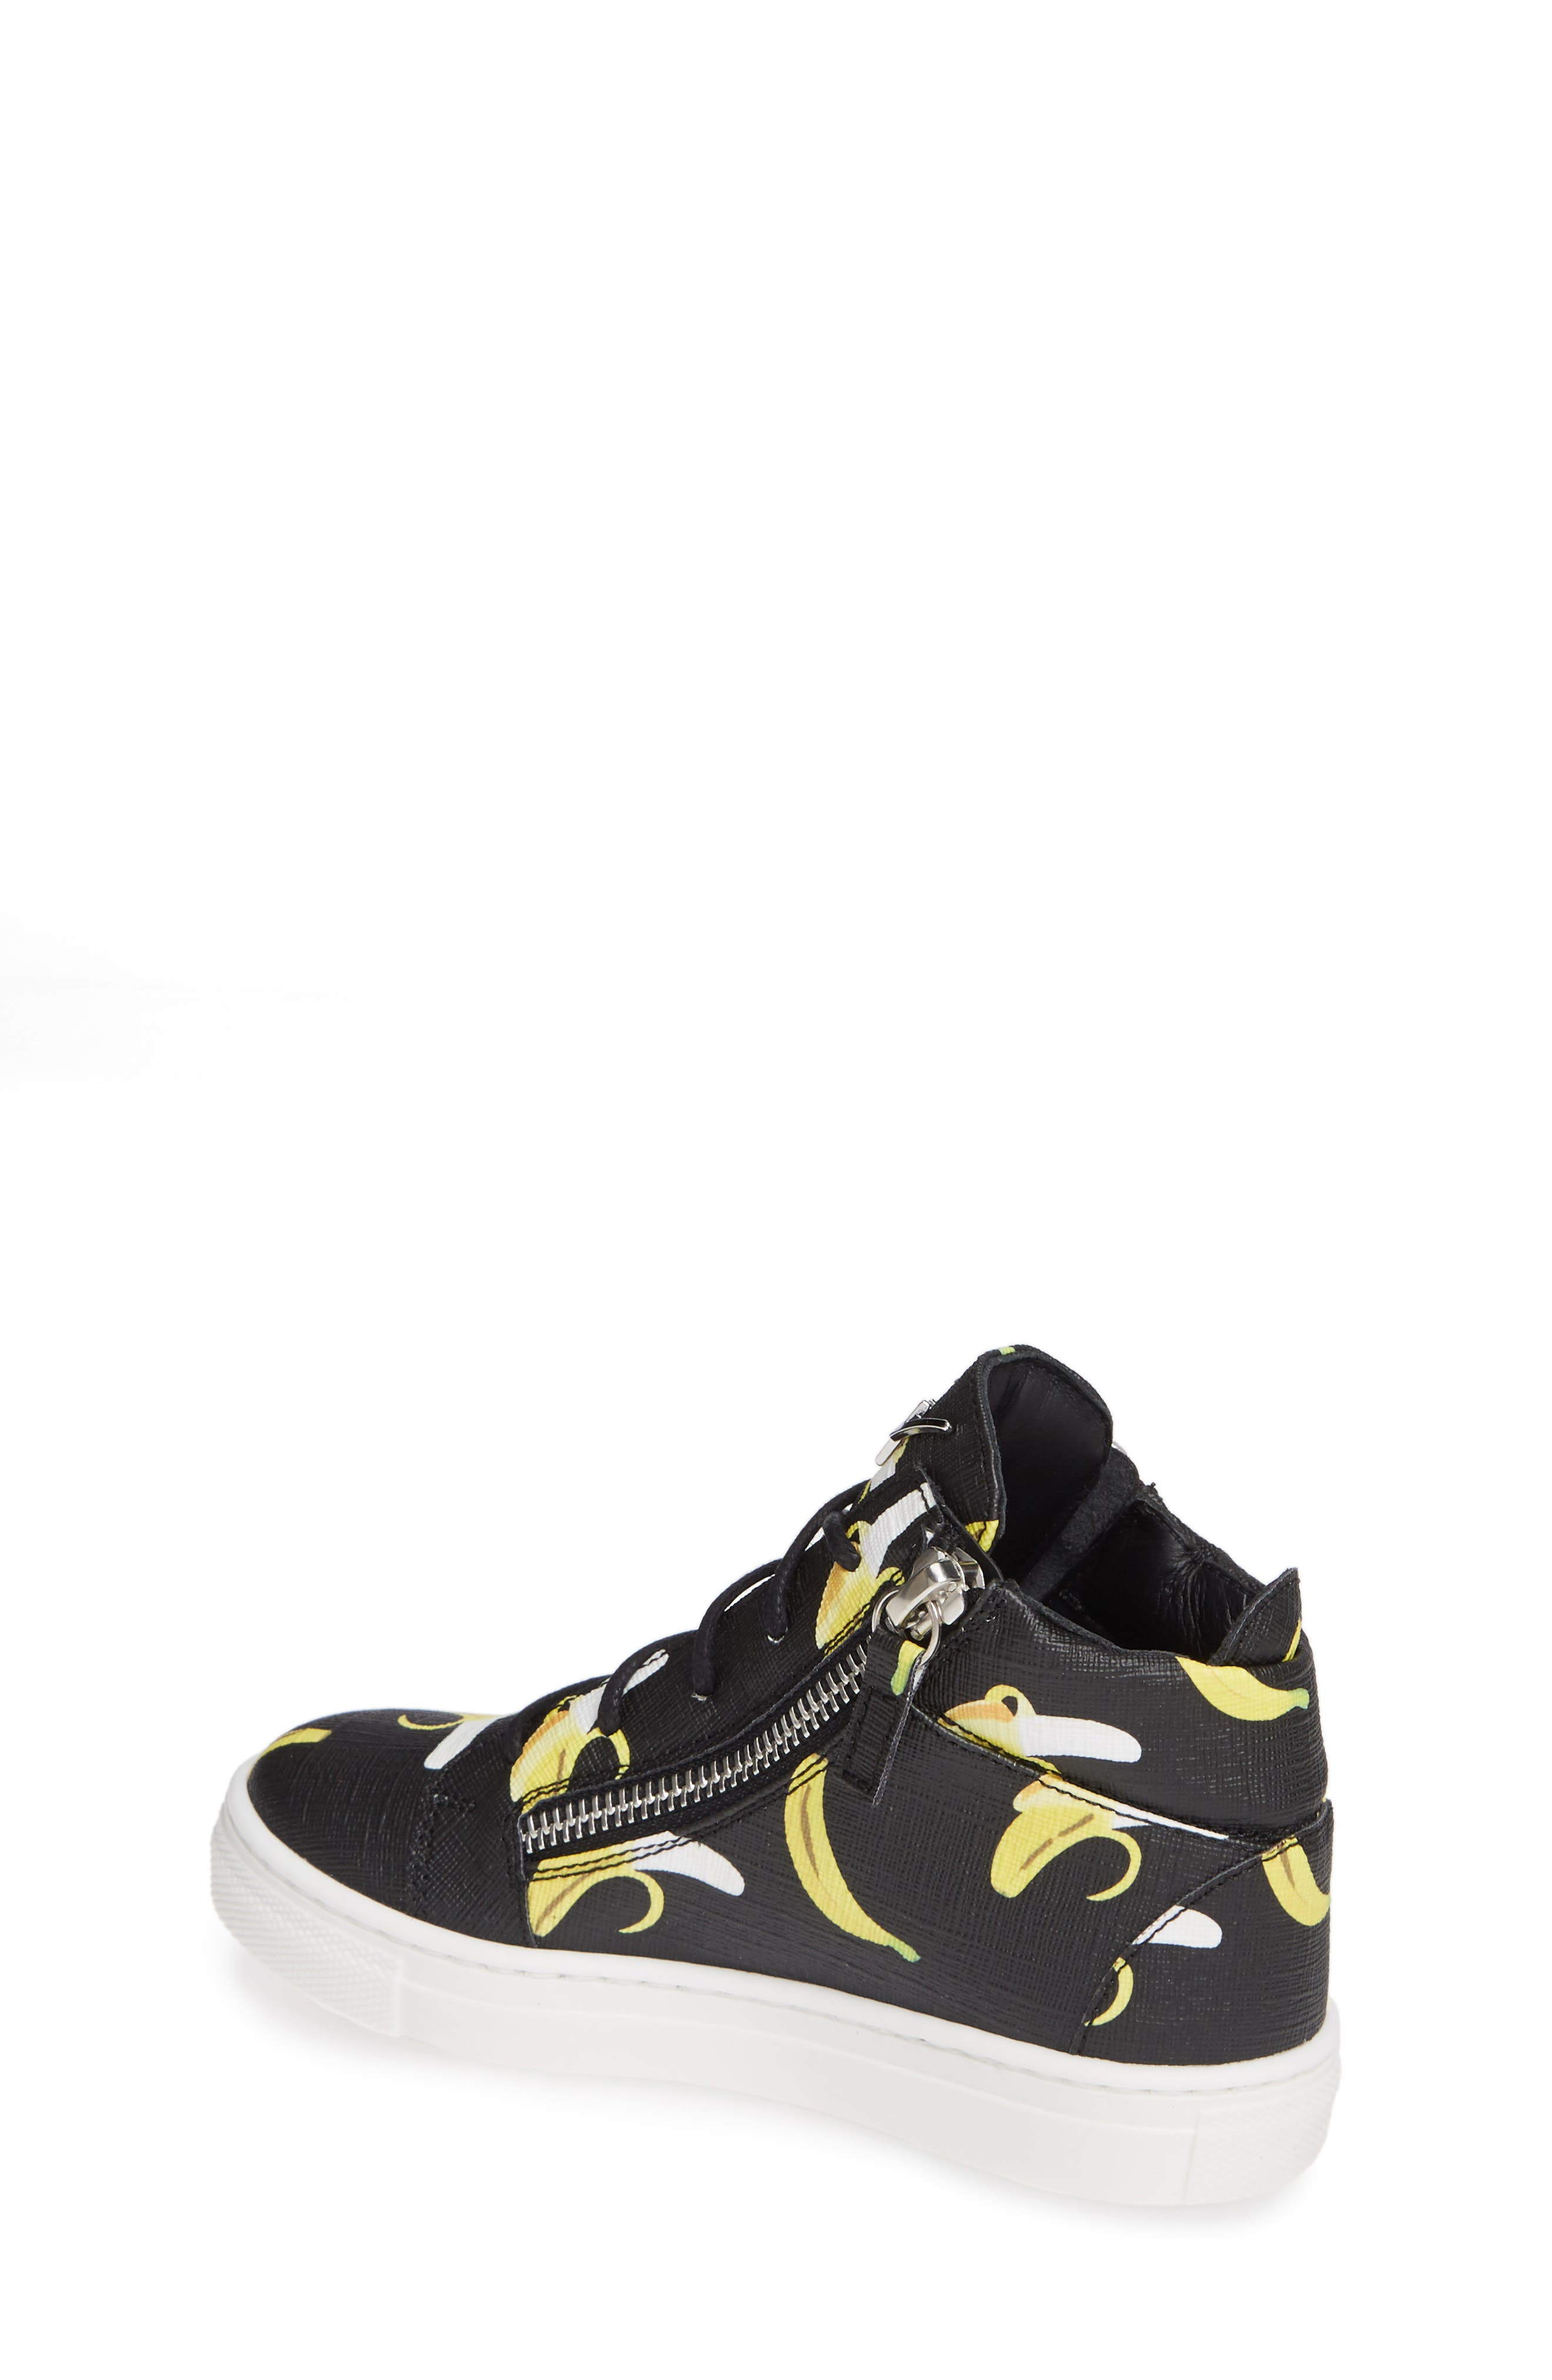 GIUSEPPE ZANOTTI, Kidlondon Banana Print Sneaker, Alternate thumbnail 2, color, BANANAS